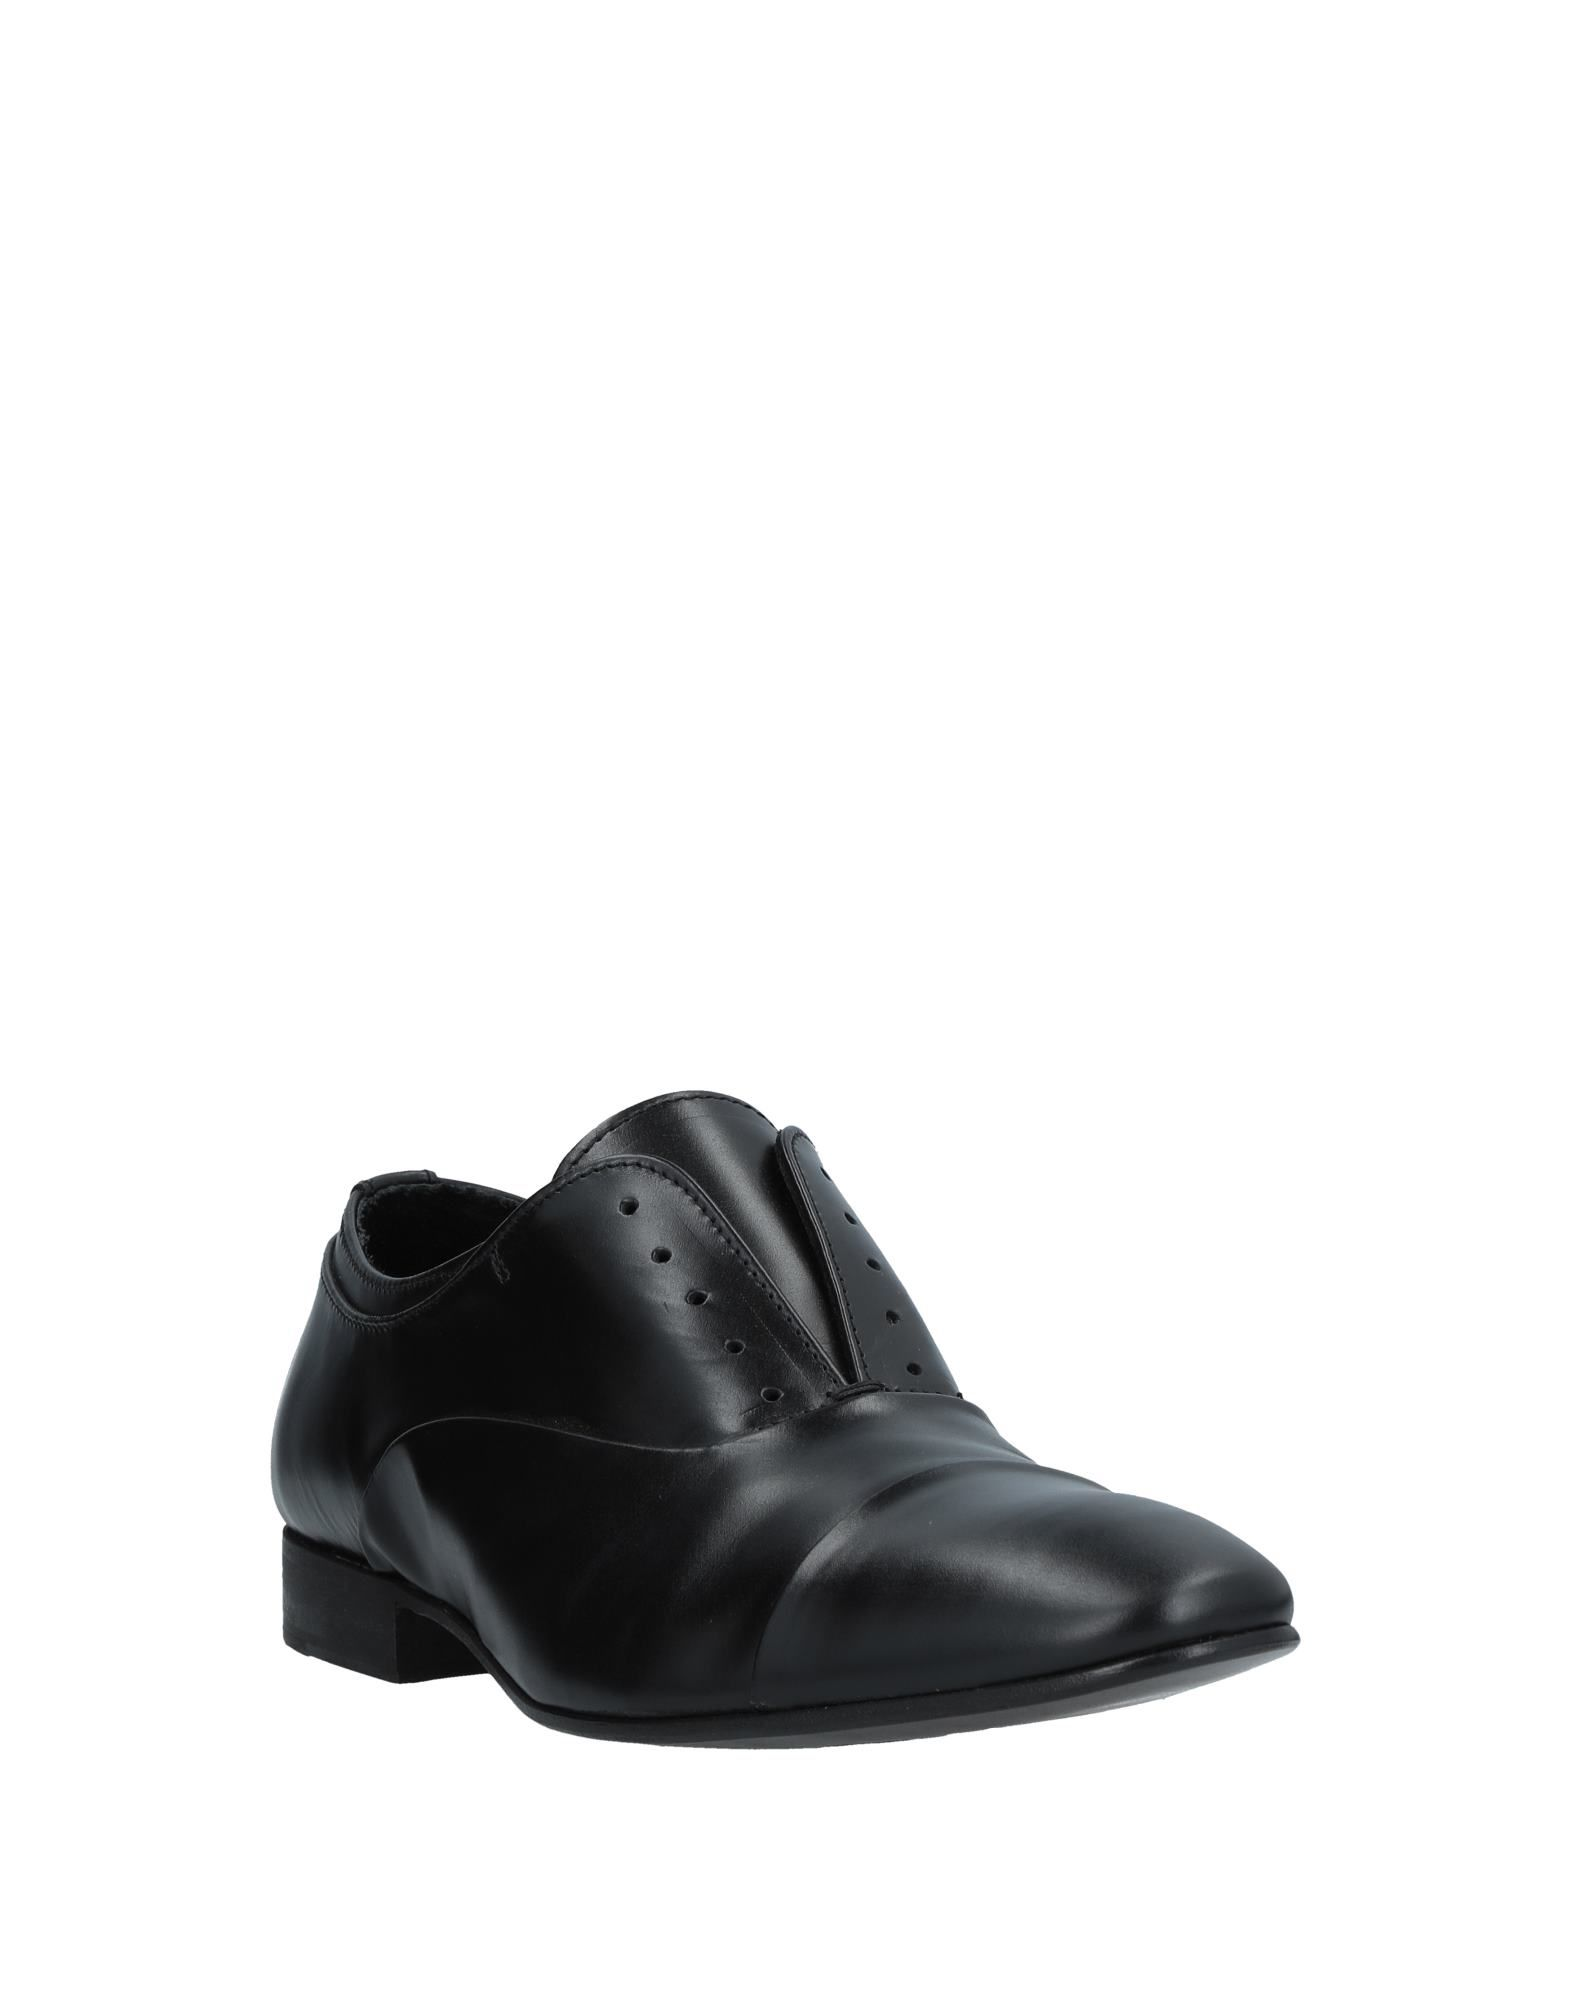 Rabatt echte Schuhe Herren Eveet Mokassins Herren Schuhe  11533957UO 496cab